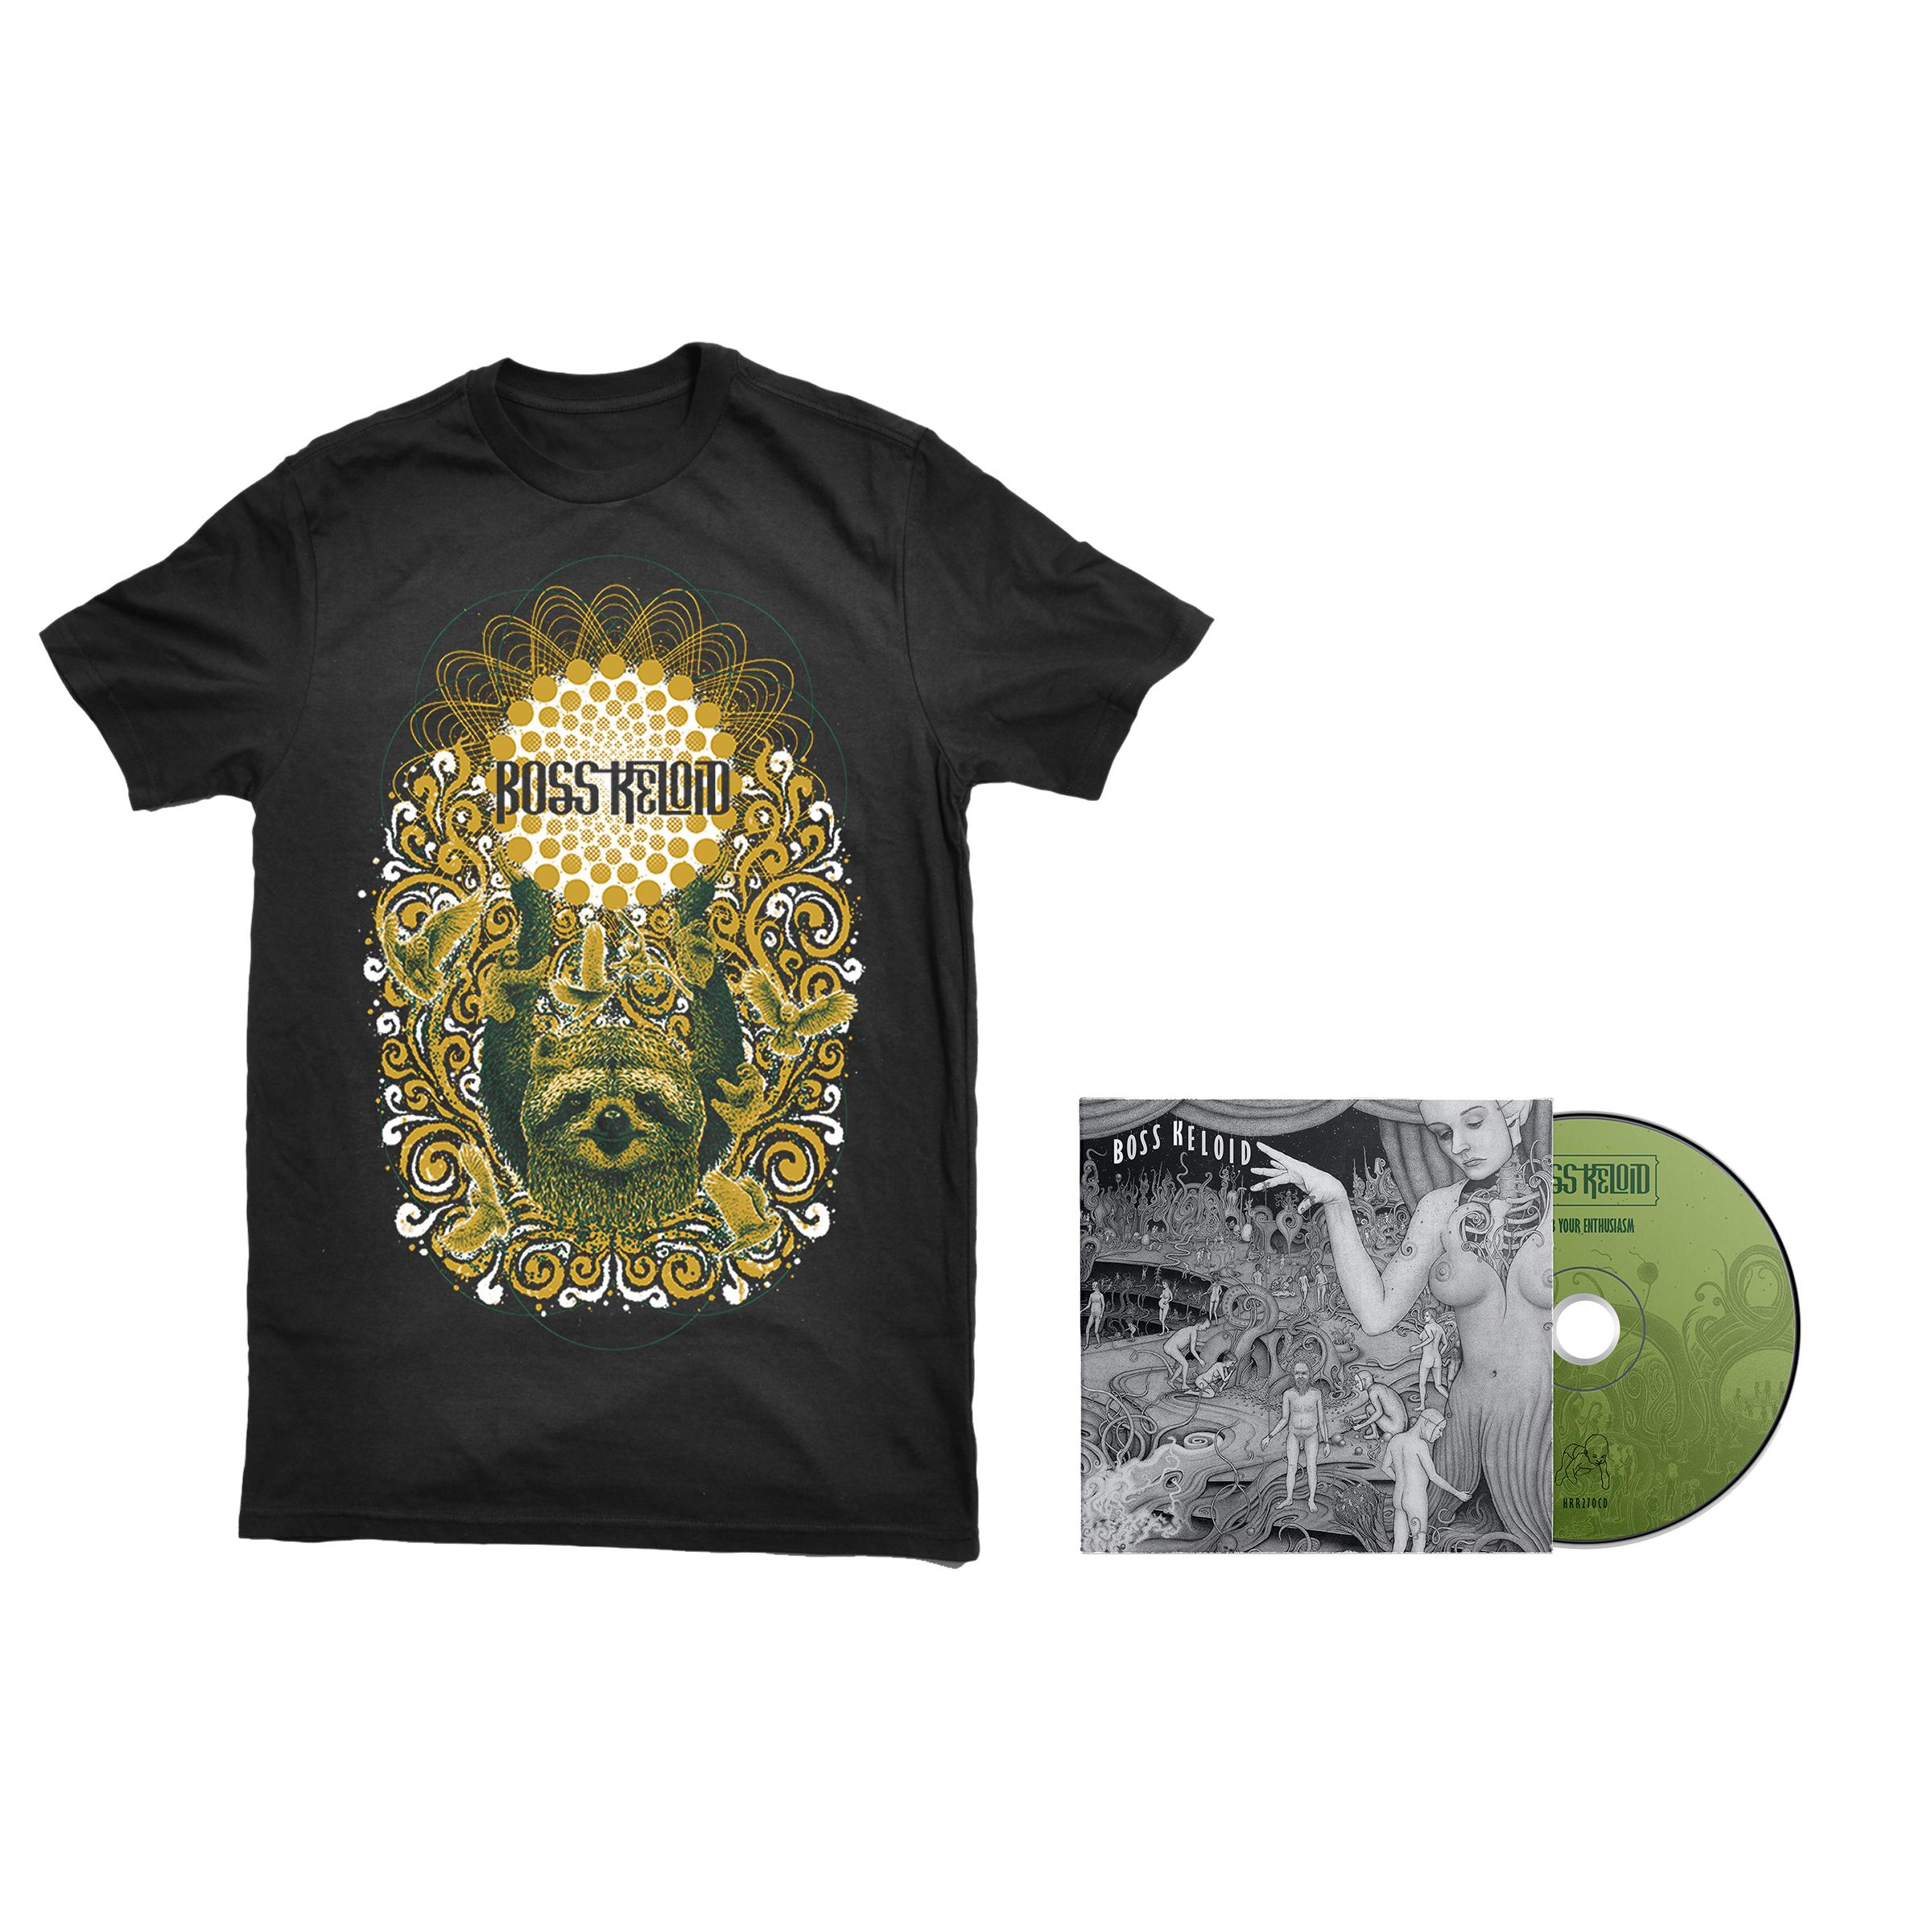 Boss Keloid - Herb Your Enthusiasm shirt + CD